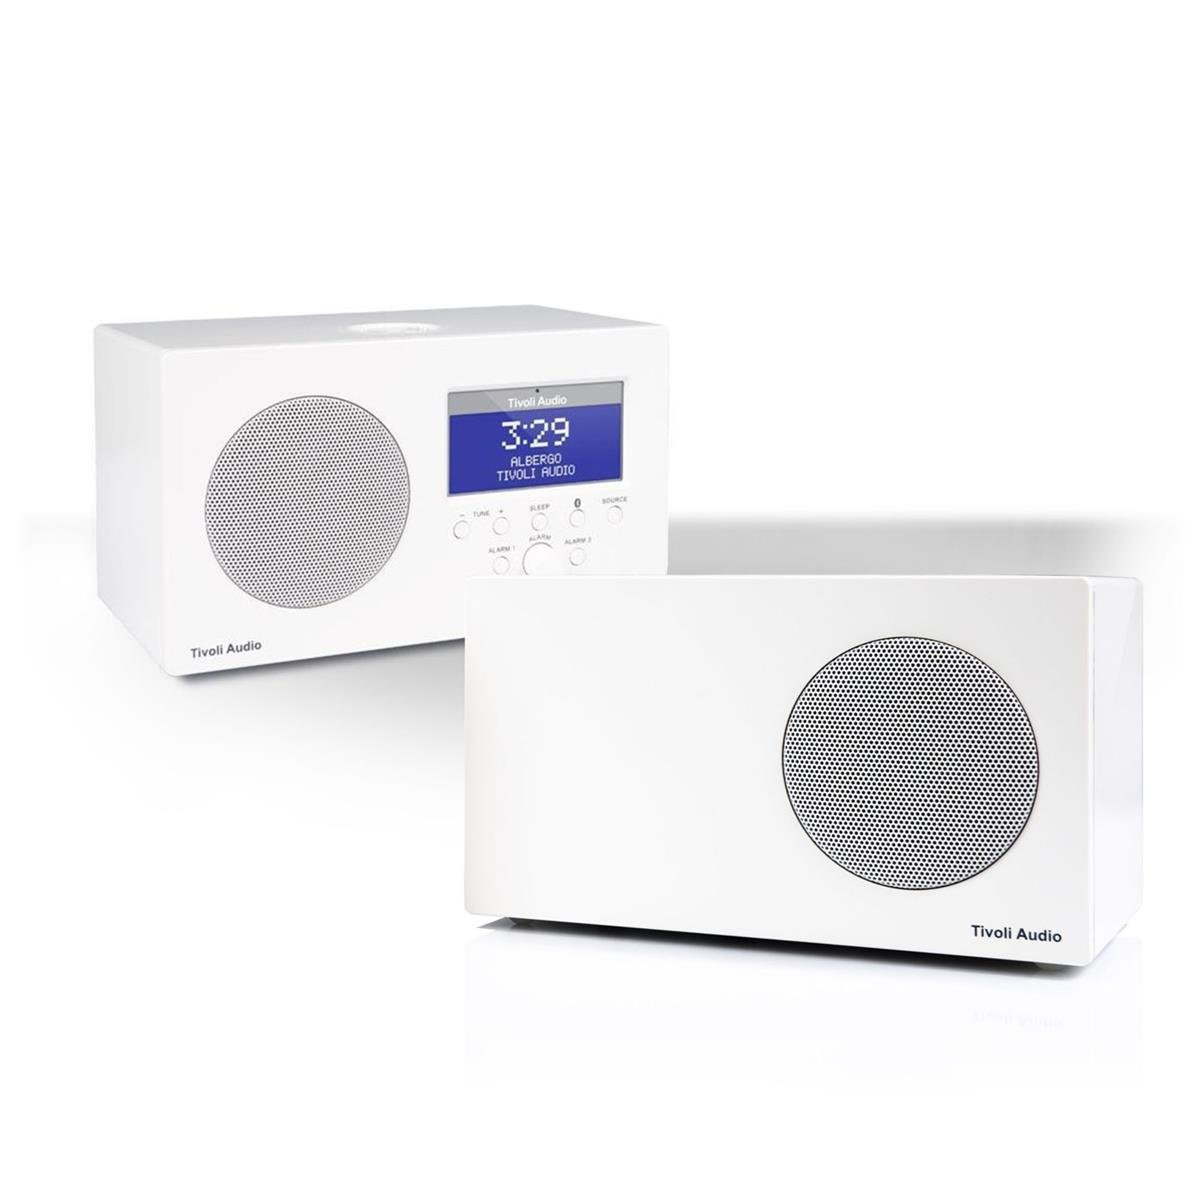 Tivoli Audio Albergo Bluetooth Clock Radio Package with Albergo Stereo Speaker (White)